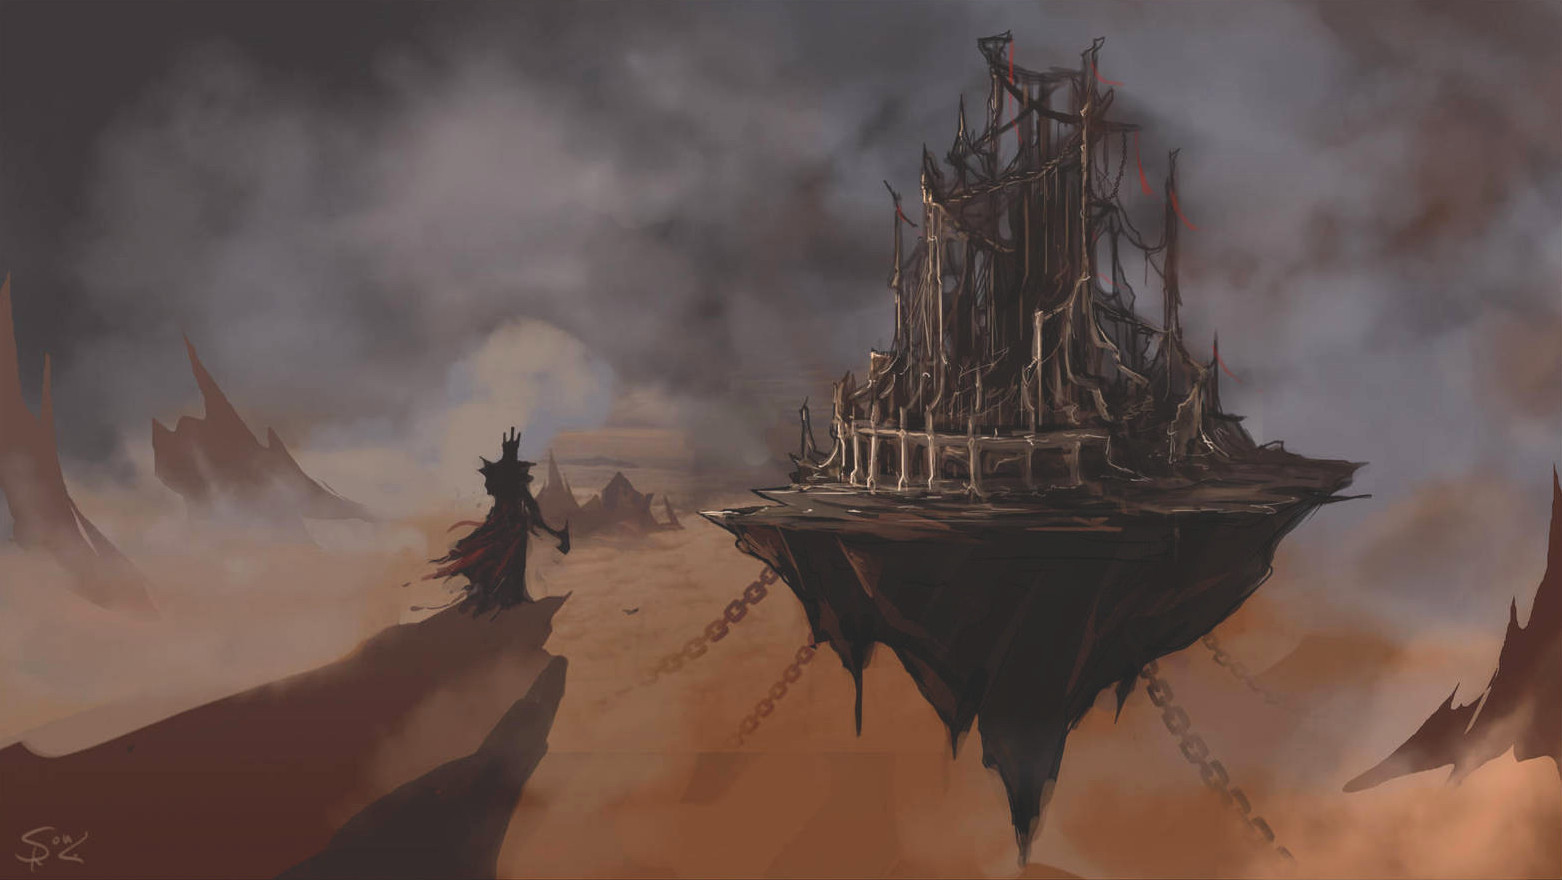 Un héro en armure se tient devant une citadelle volante